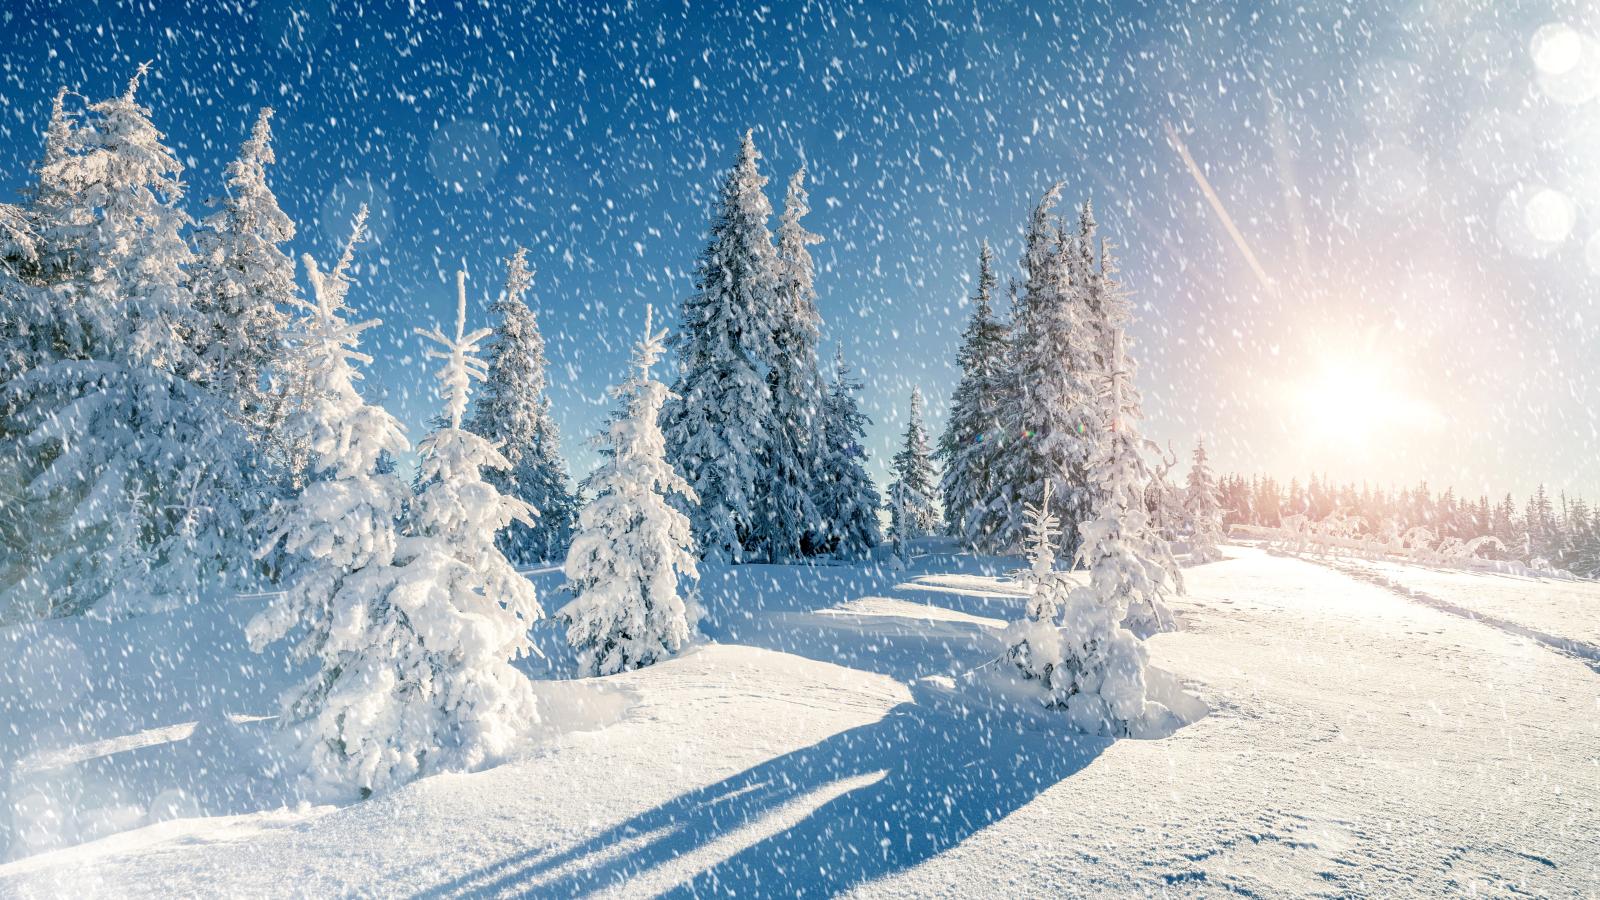 winter trees snow season hd 4k wallpaper